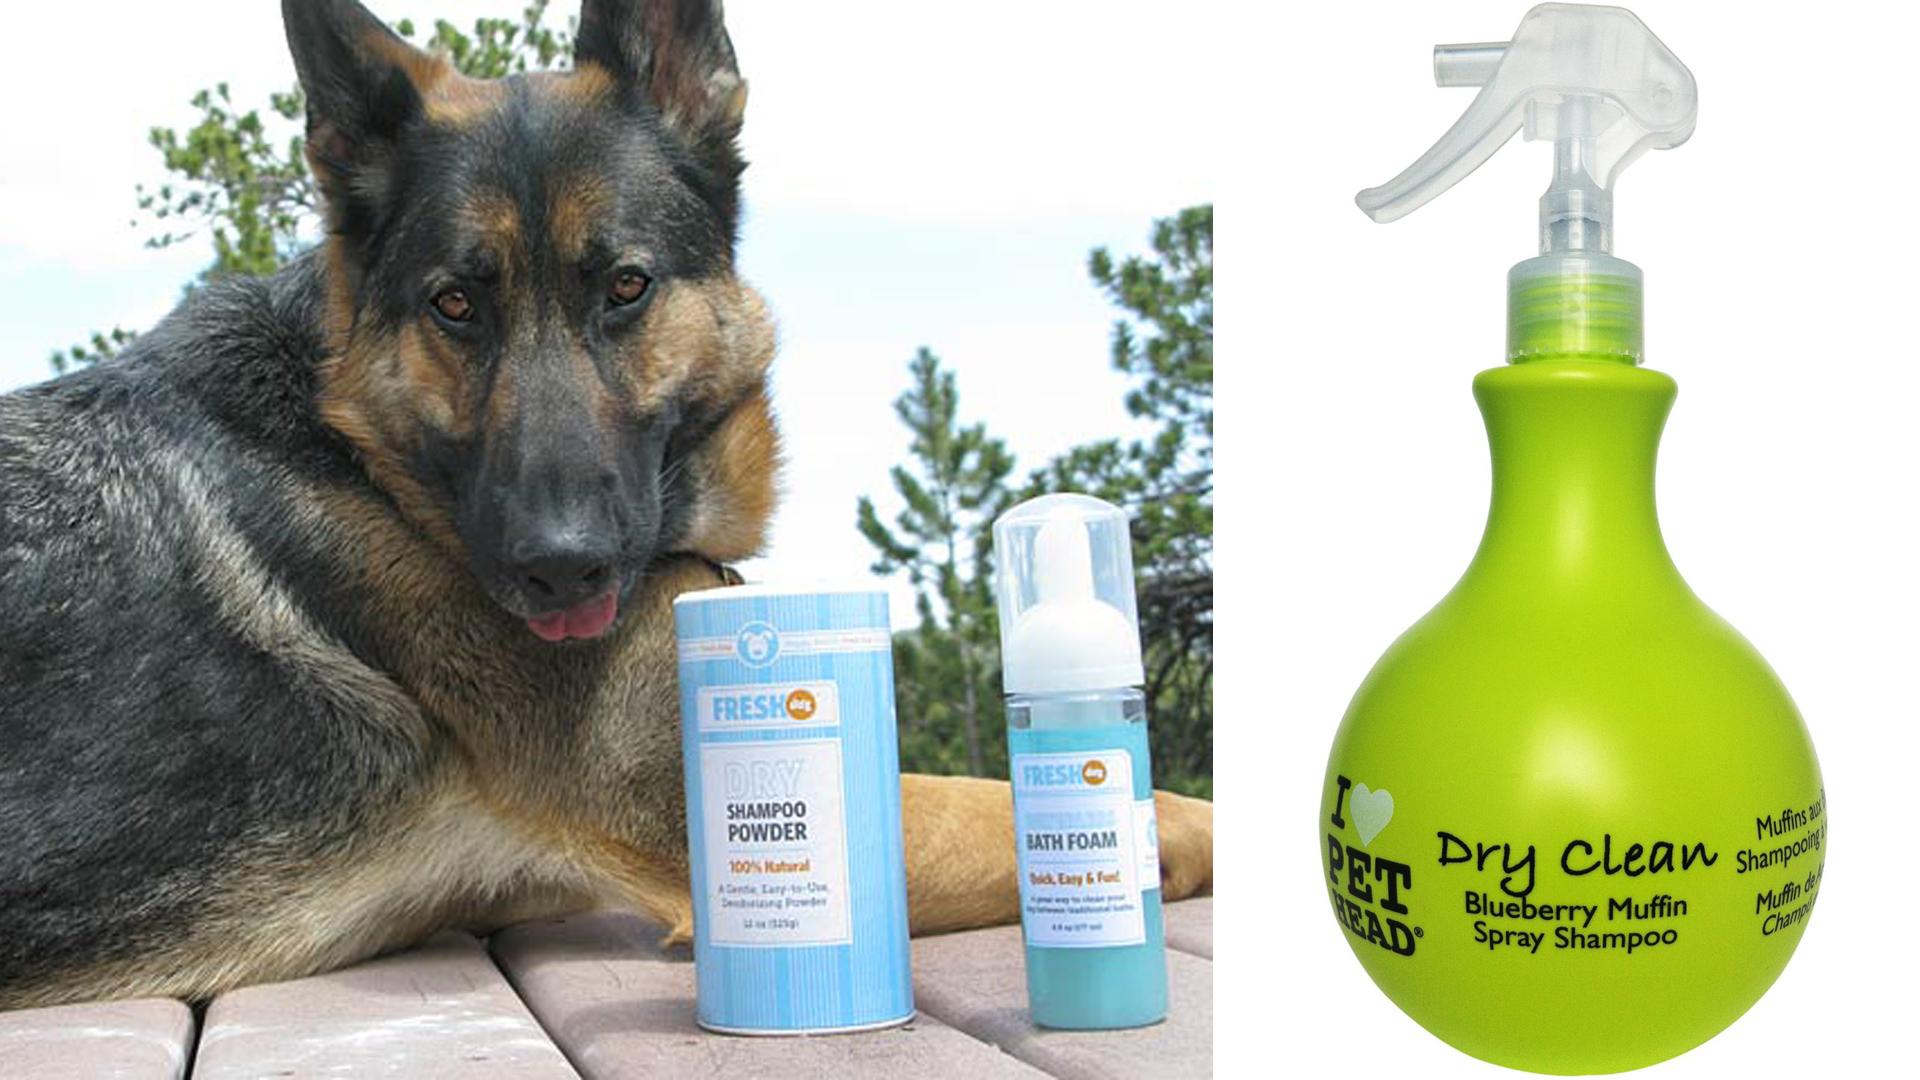 Can You Give A Dog A Bath With Regular Shampoo